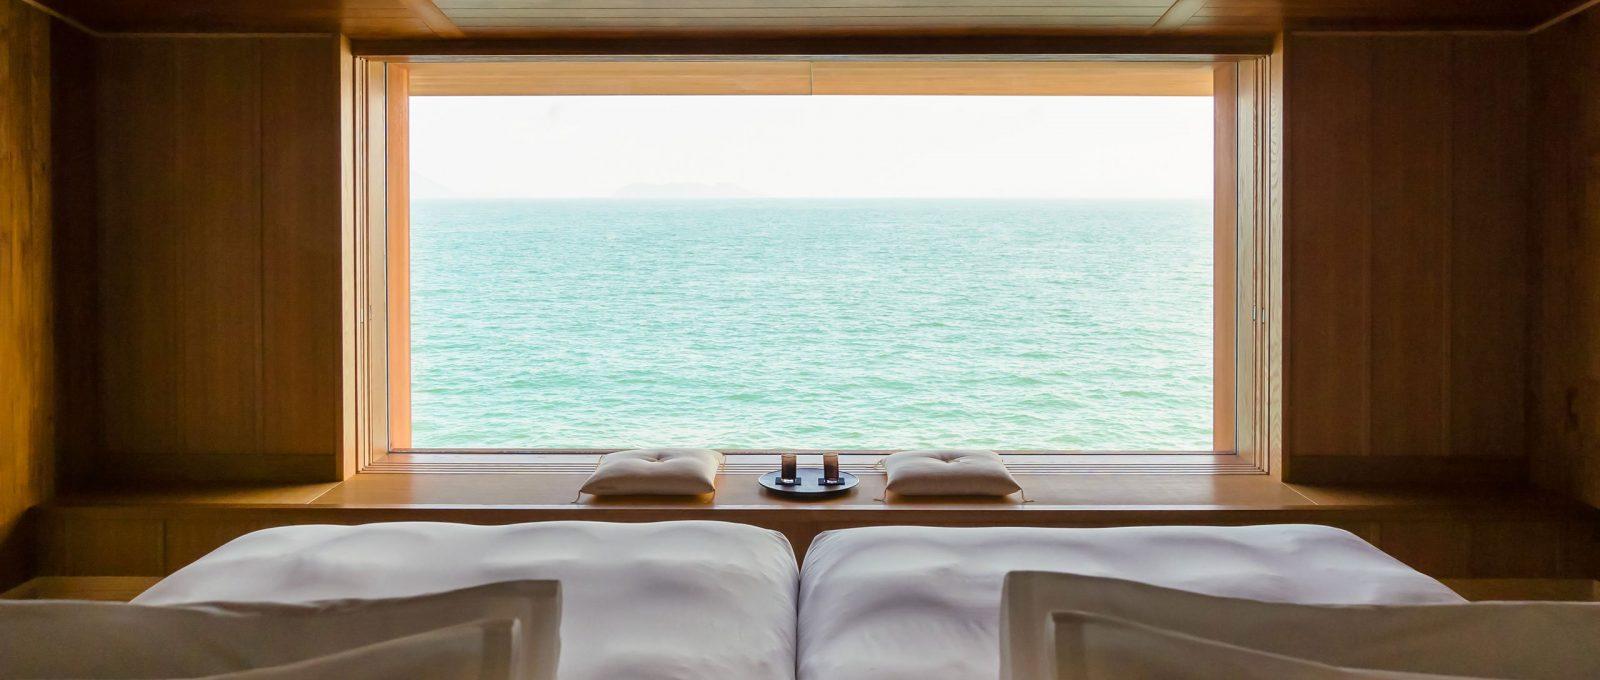 Guntû, the floating hotel that sails the Japanese coast